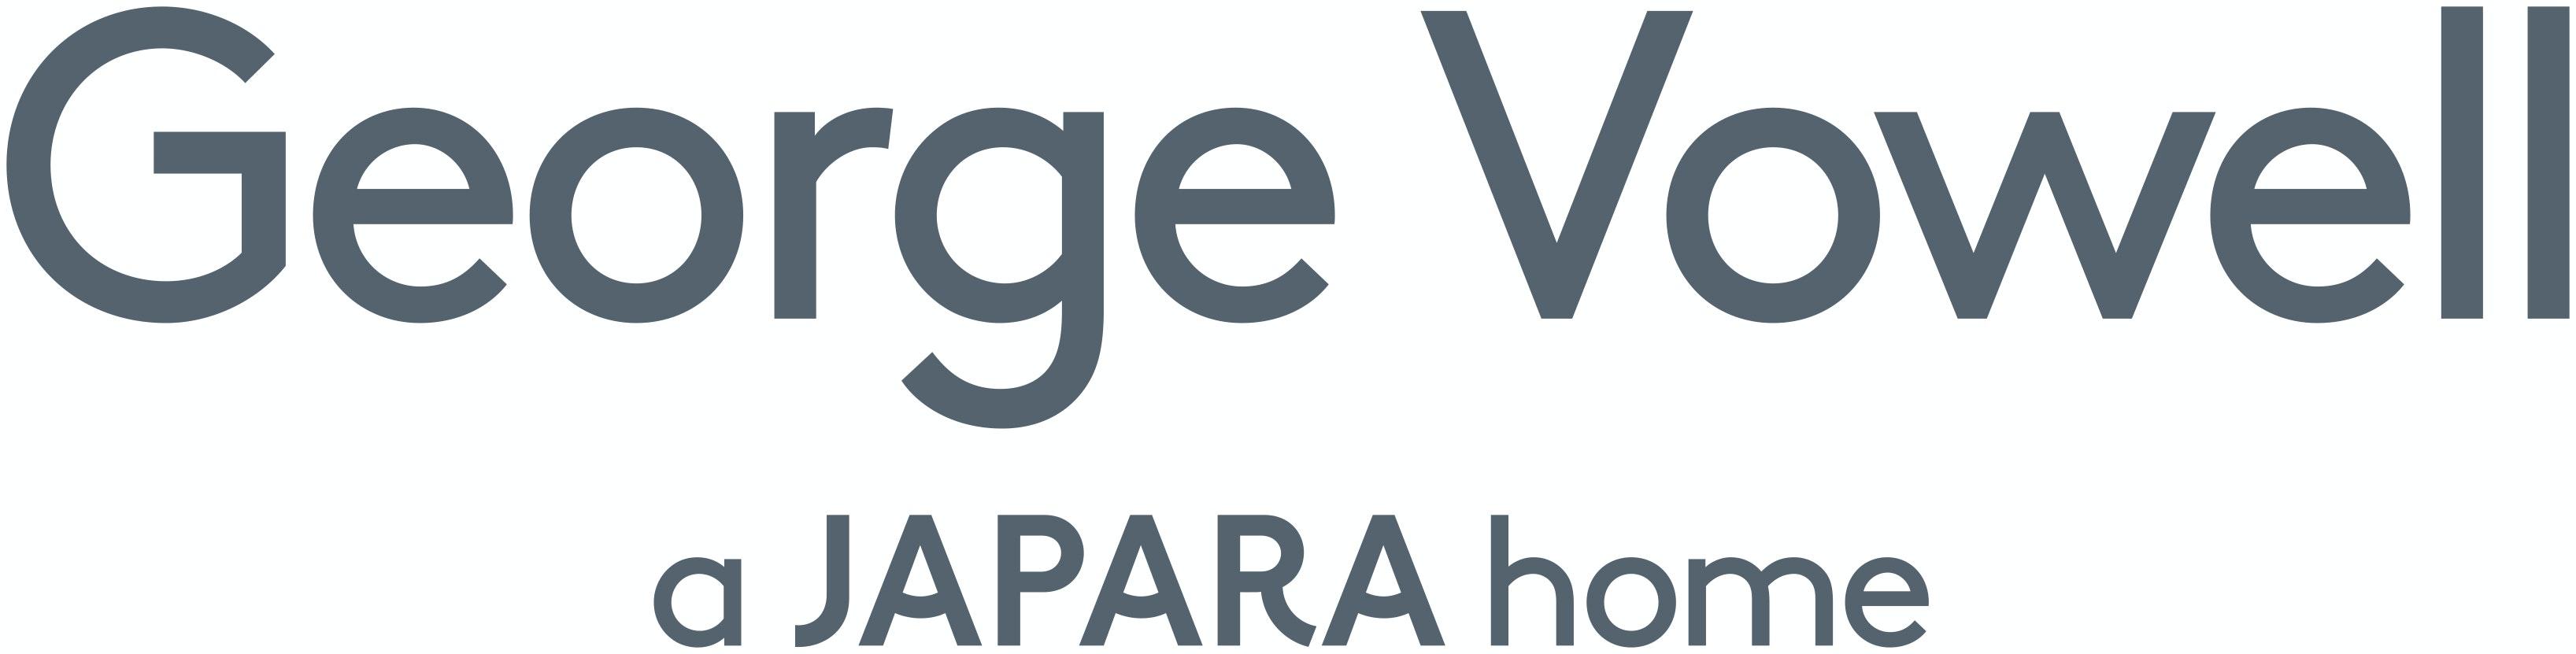 George Vowell logo